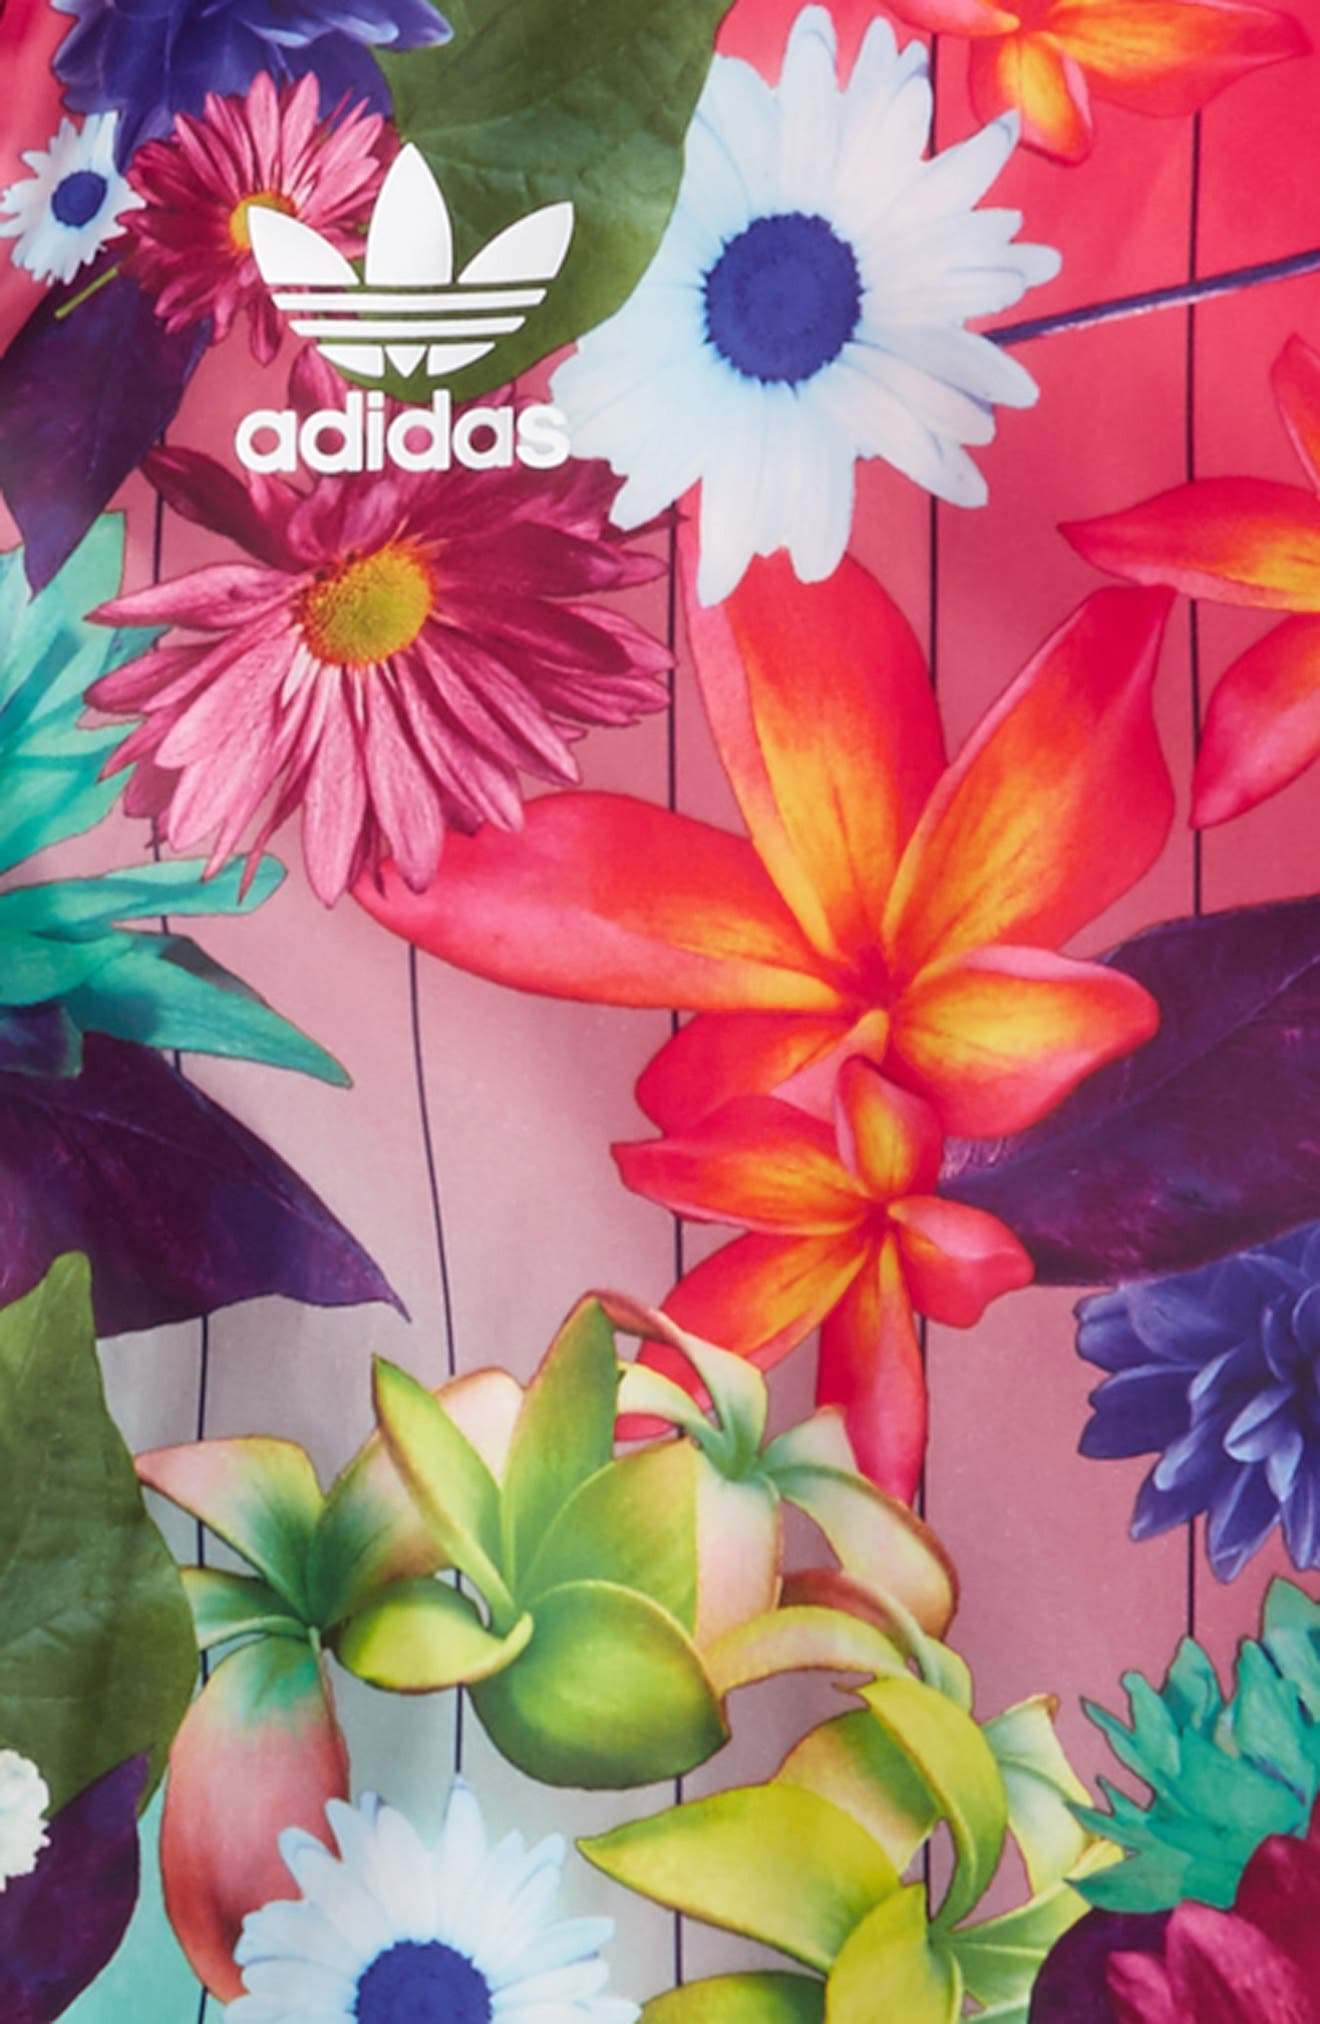 adidas Graphic Windbreaker Jacket,                             Alternate thumbnail 2, color,                             Multicolor